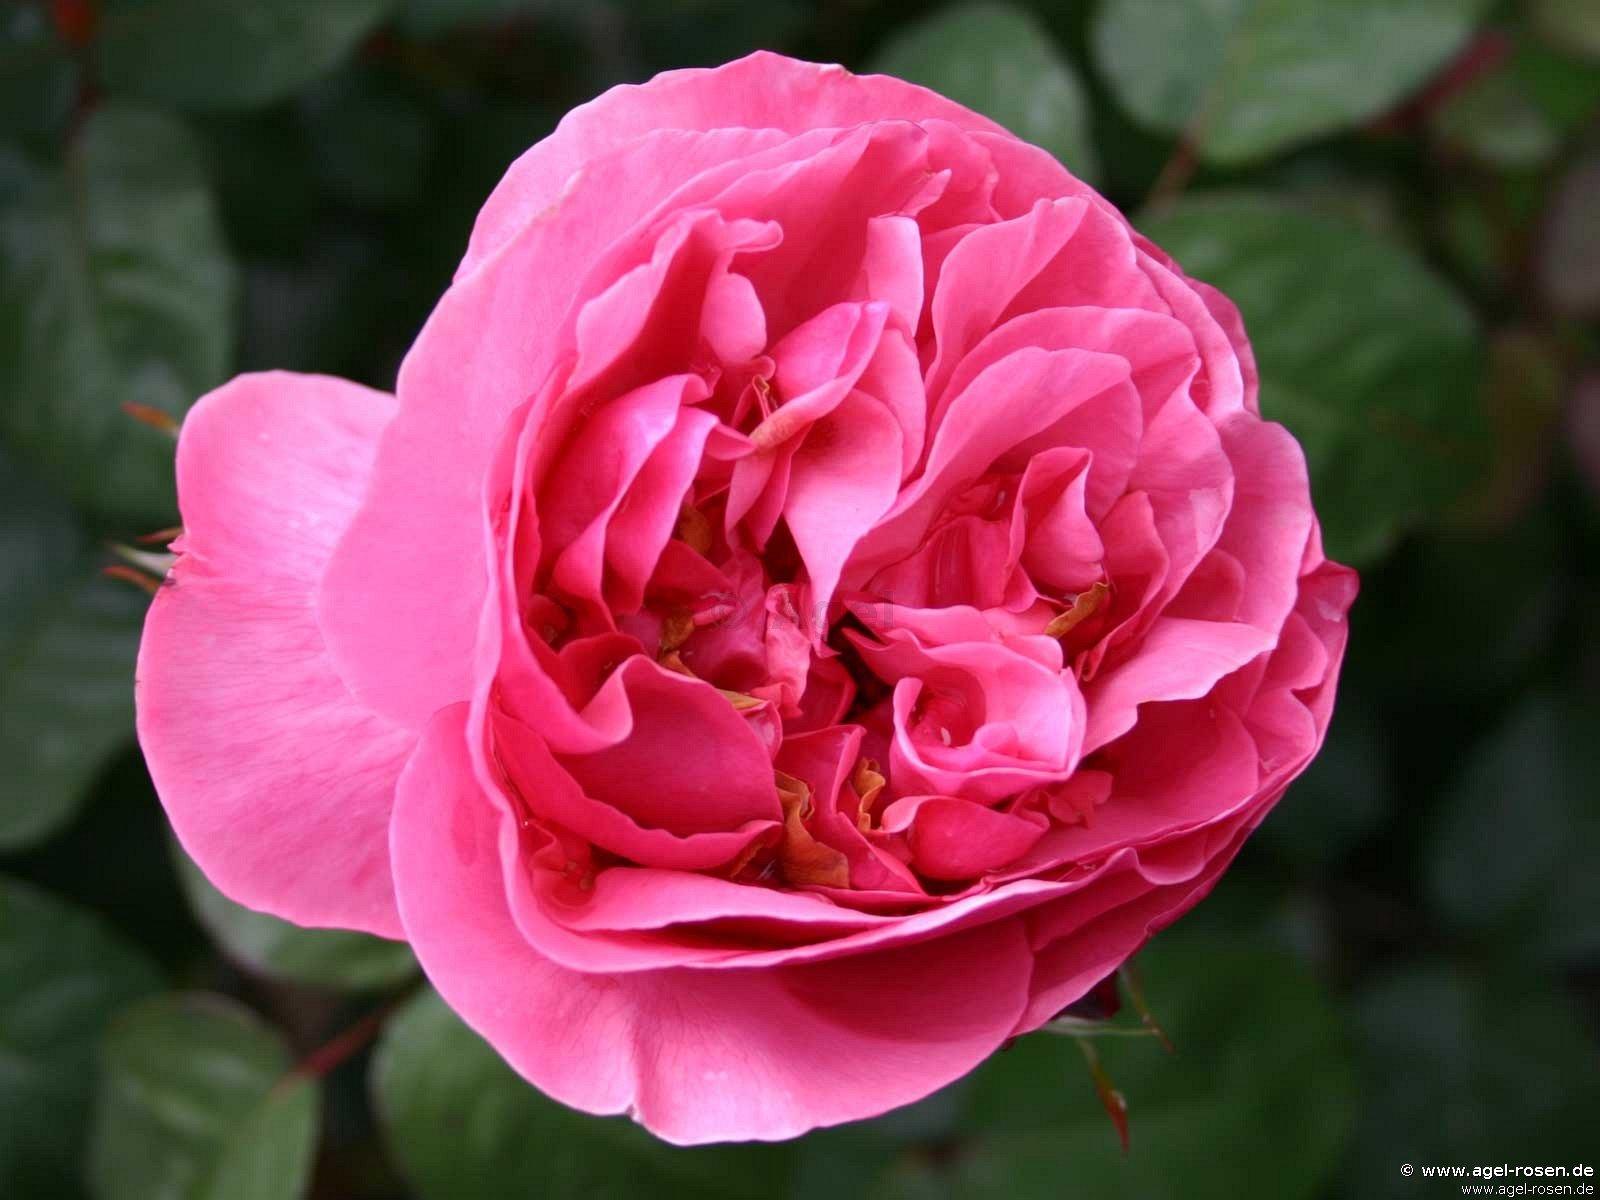 elbflorenz edelrose kaufen bei agel rosen. Black Bedroom Furniture Sets. Home Design Ideas